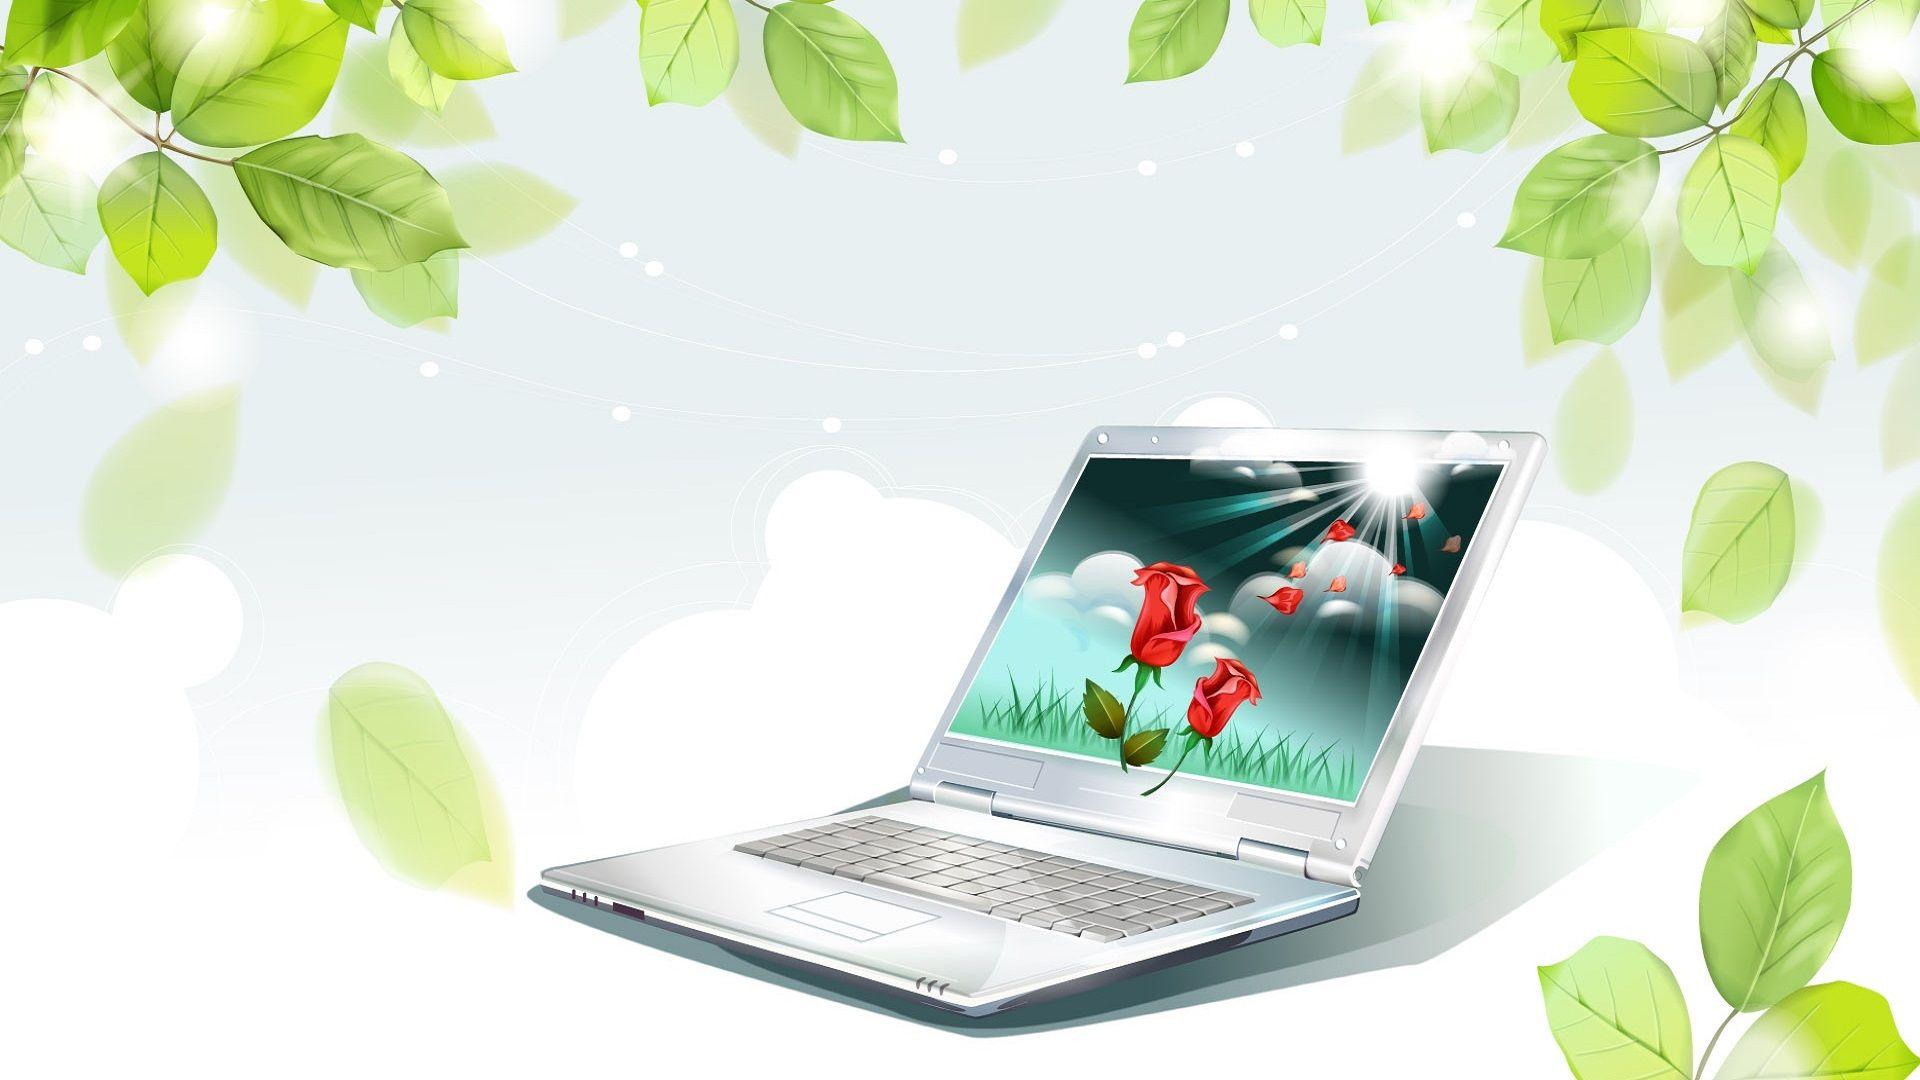 Laptop Wallpaper Laptop wallpaper, Wallpaper powerpoint